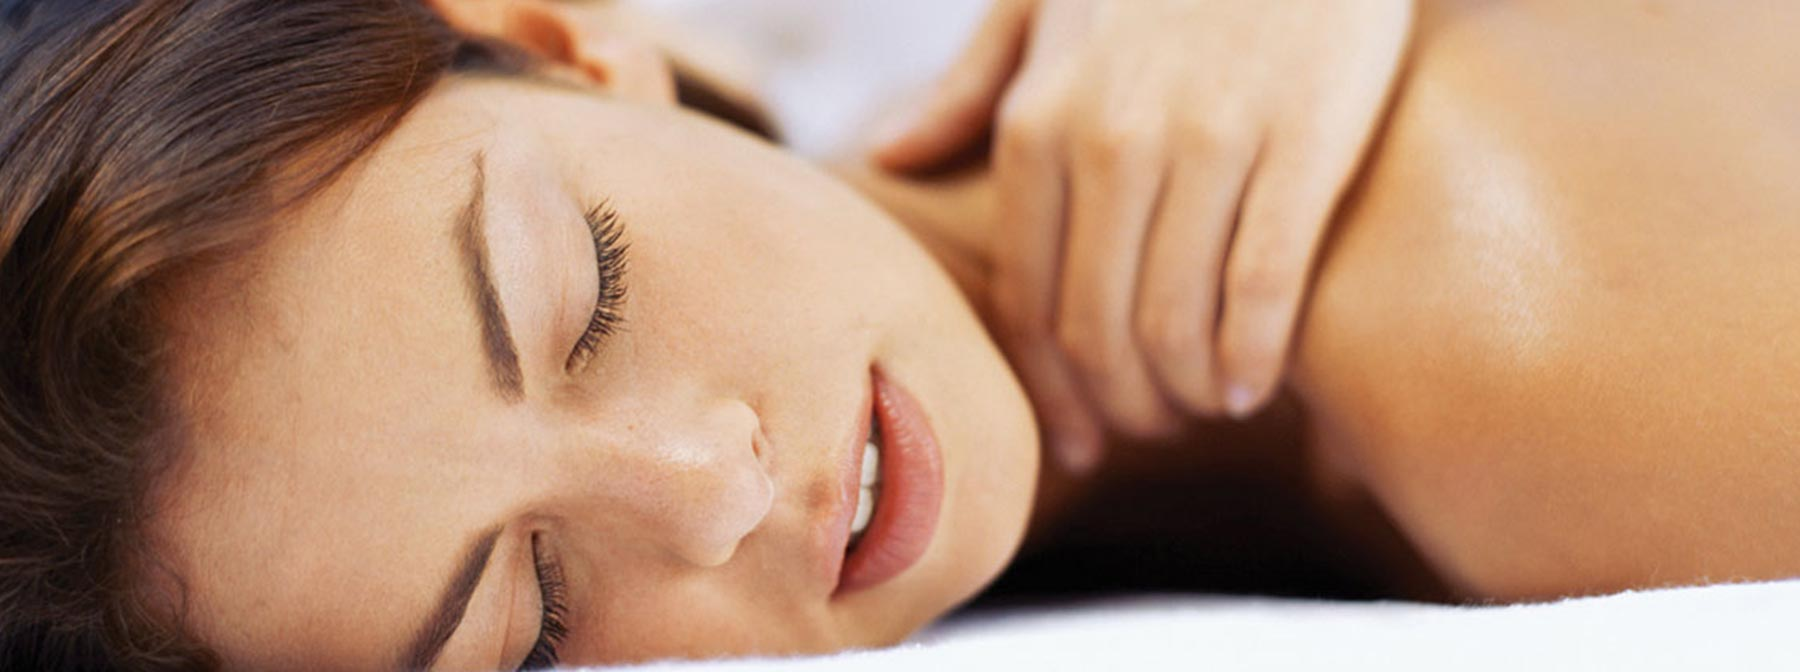 A woman lying on a bed enjoying a neck massage spa treatment